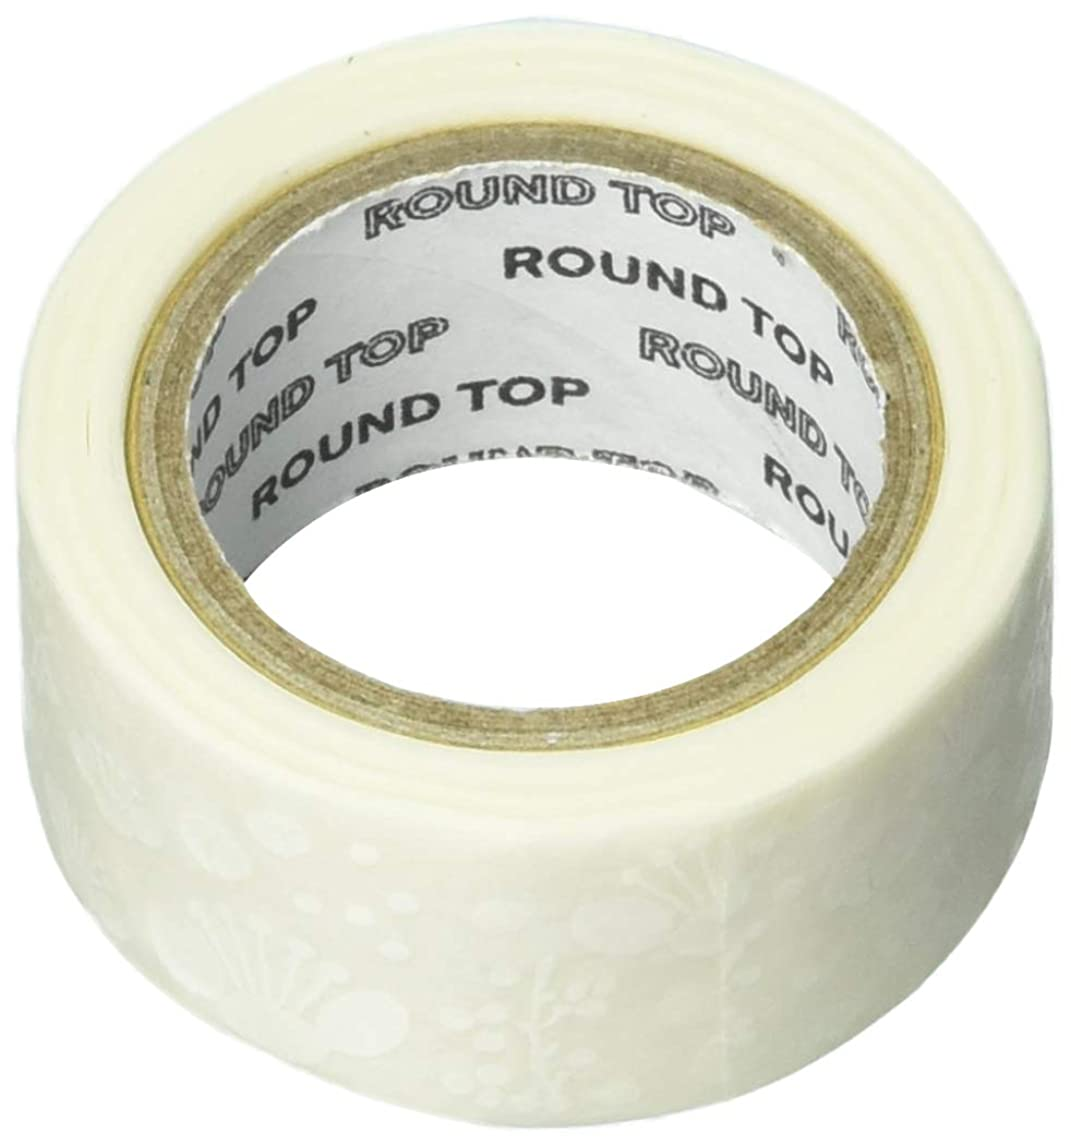 Roundtop Designer's Washi Masking Tape 20mm x 8m, Yano Design White Winter, Ume (YD-MK-086)